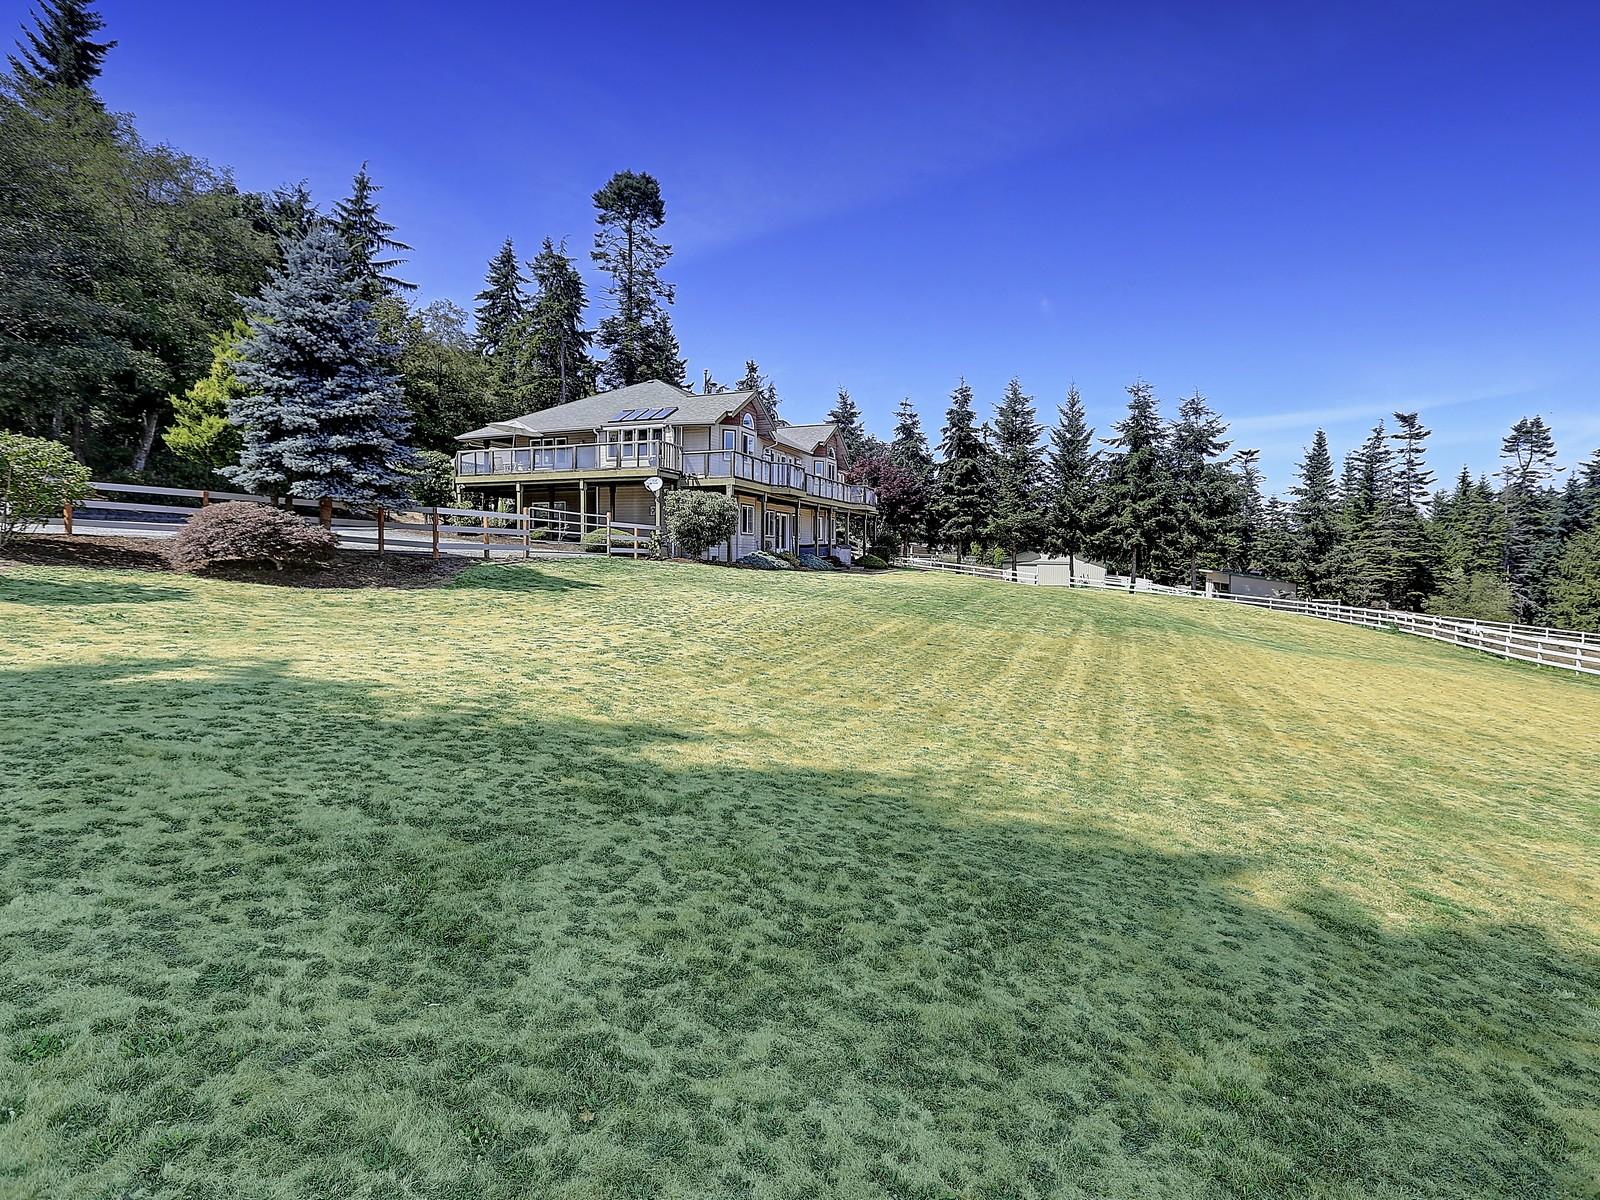 Farm / Ranch / Plantation for Sale at Equestirian Estate on Camano Island 964 SE Camano Dr Camano Island, Washington 98282 United States